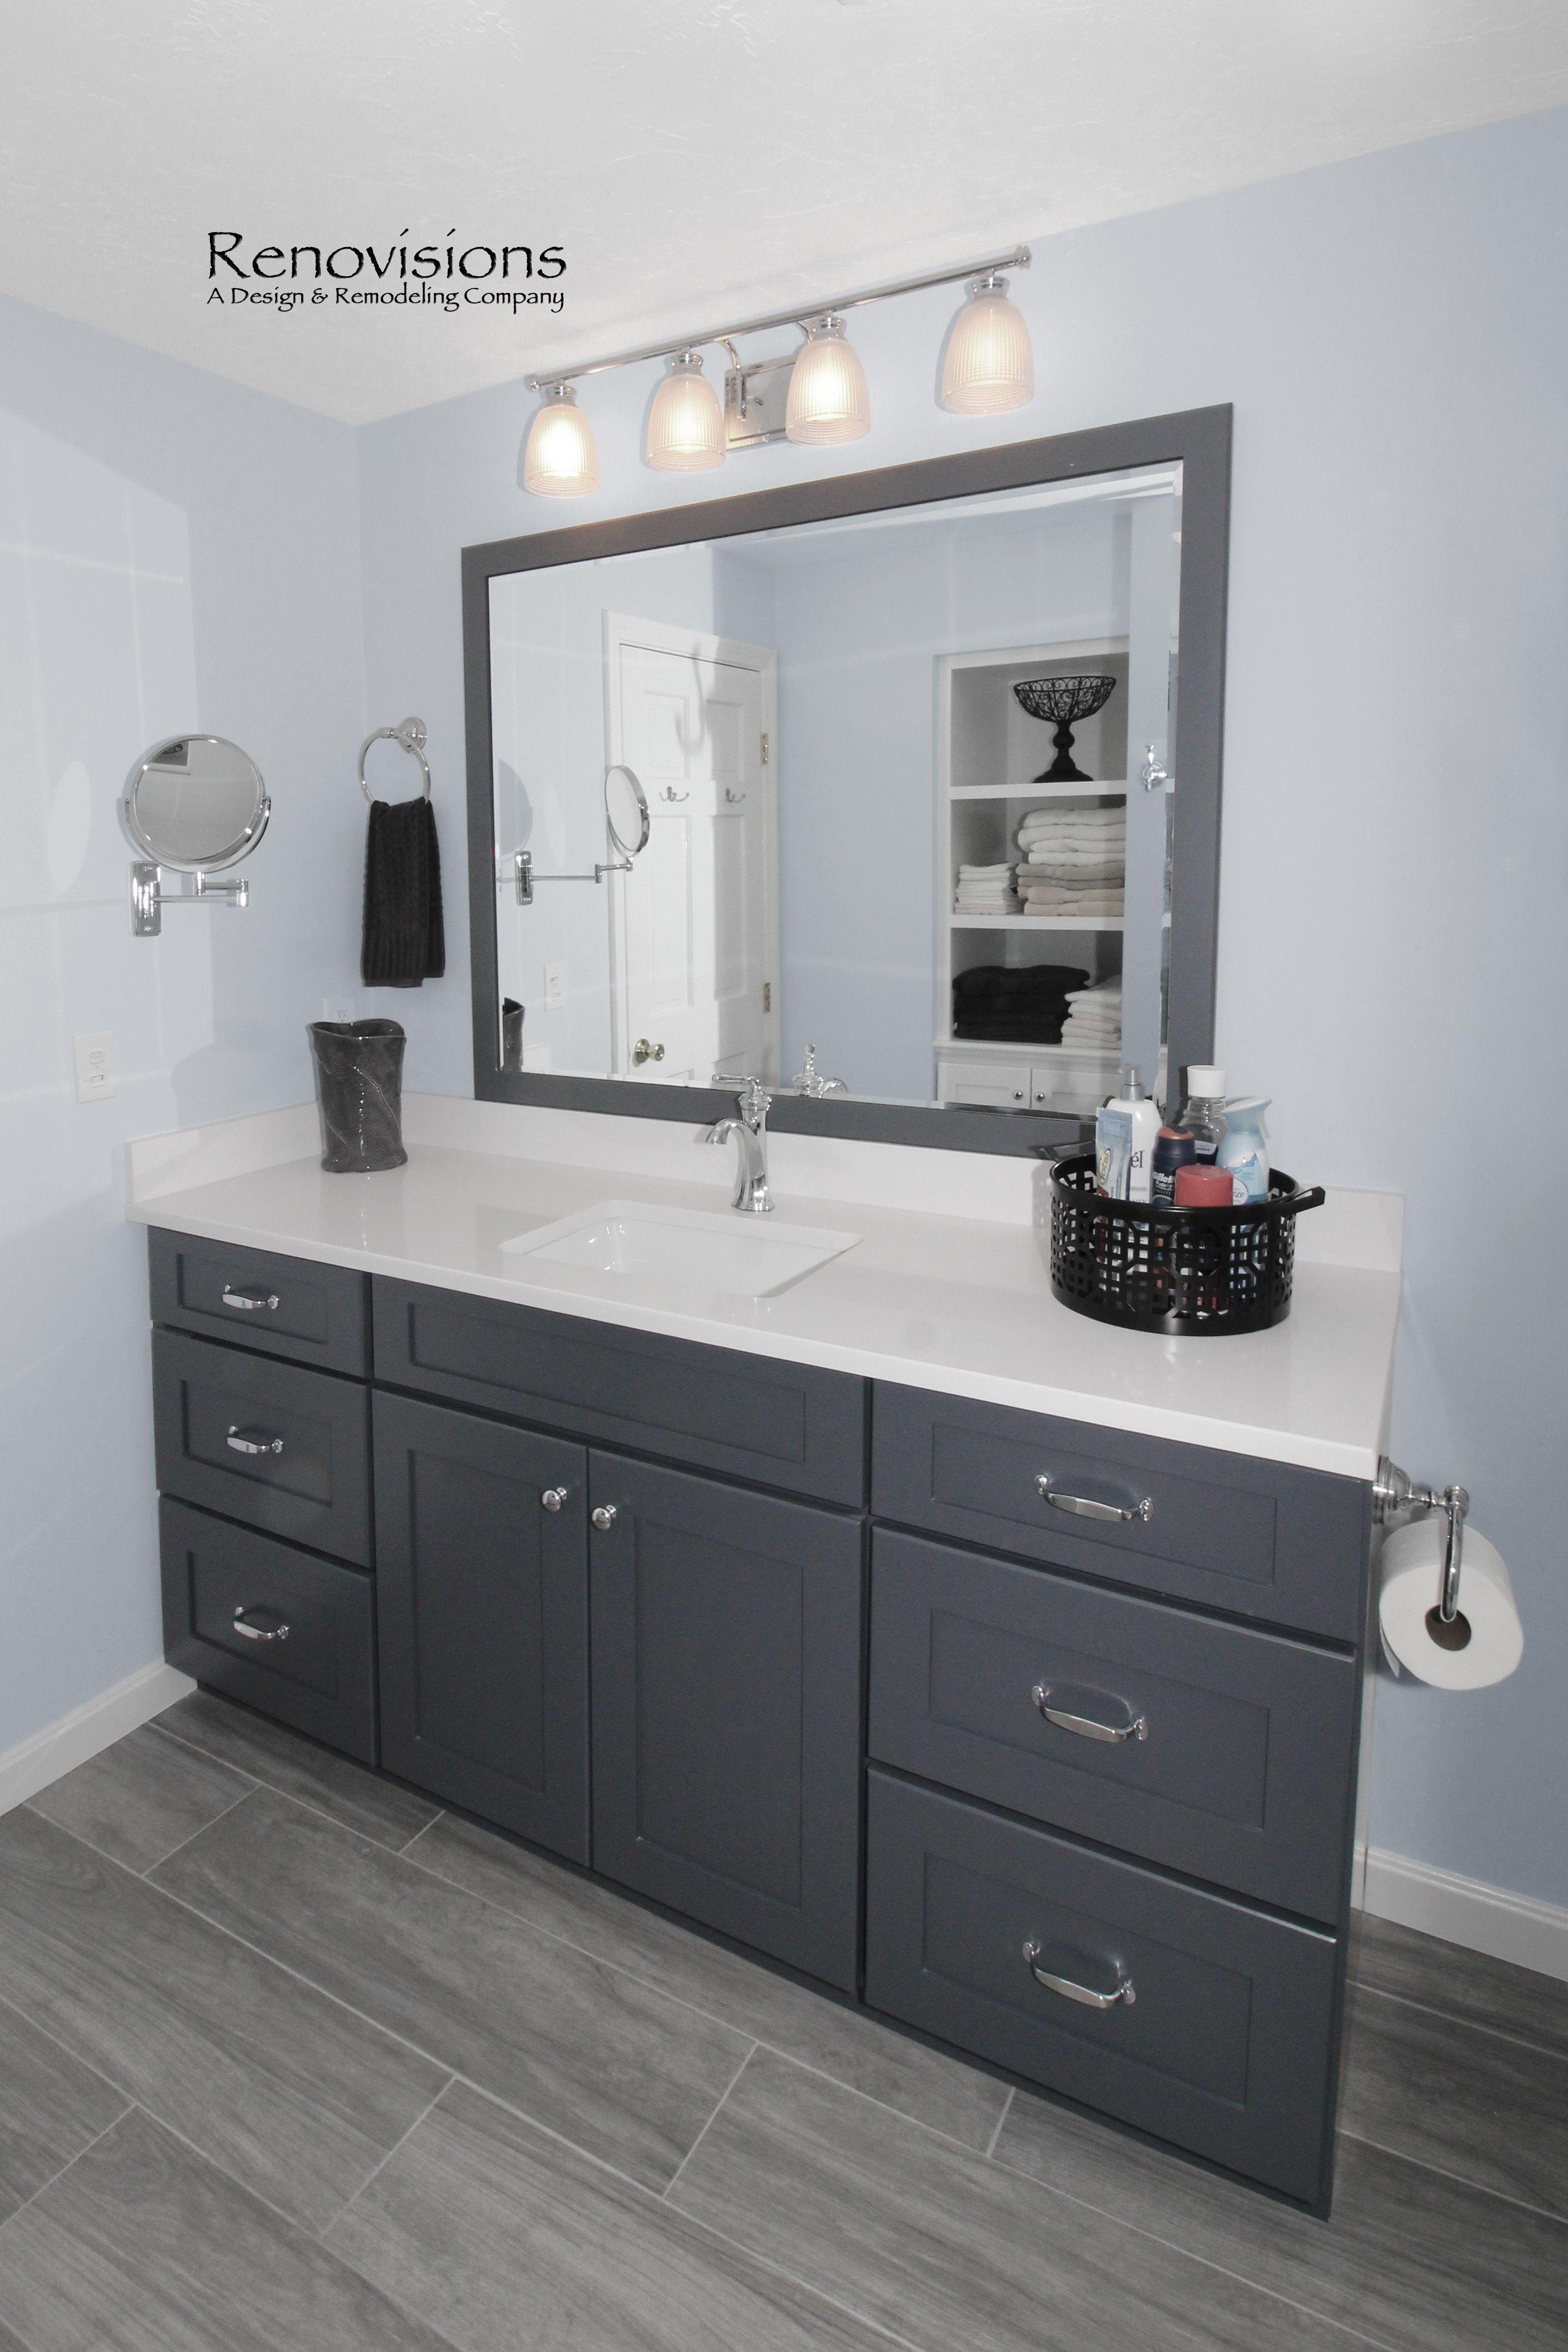 Full Bathroom Remodel By Renovisions In Norwell Ma Wood Look Porcelain Plank Tile Flooring Plan Grey Wood Floors Wood Look Tile Bathroom Grey Bathroom Floor